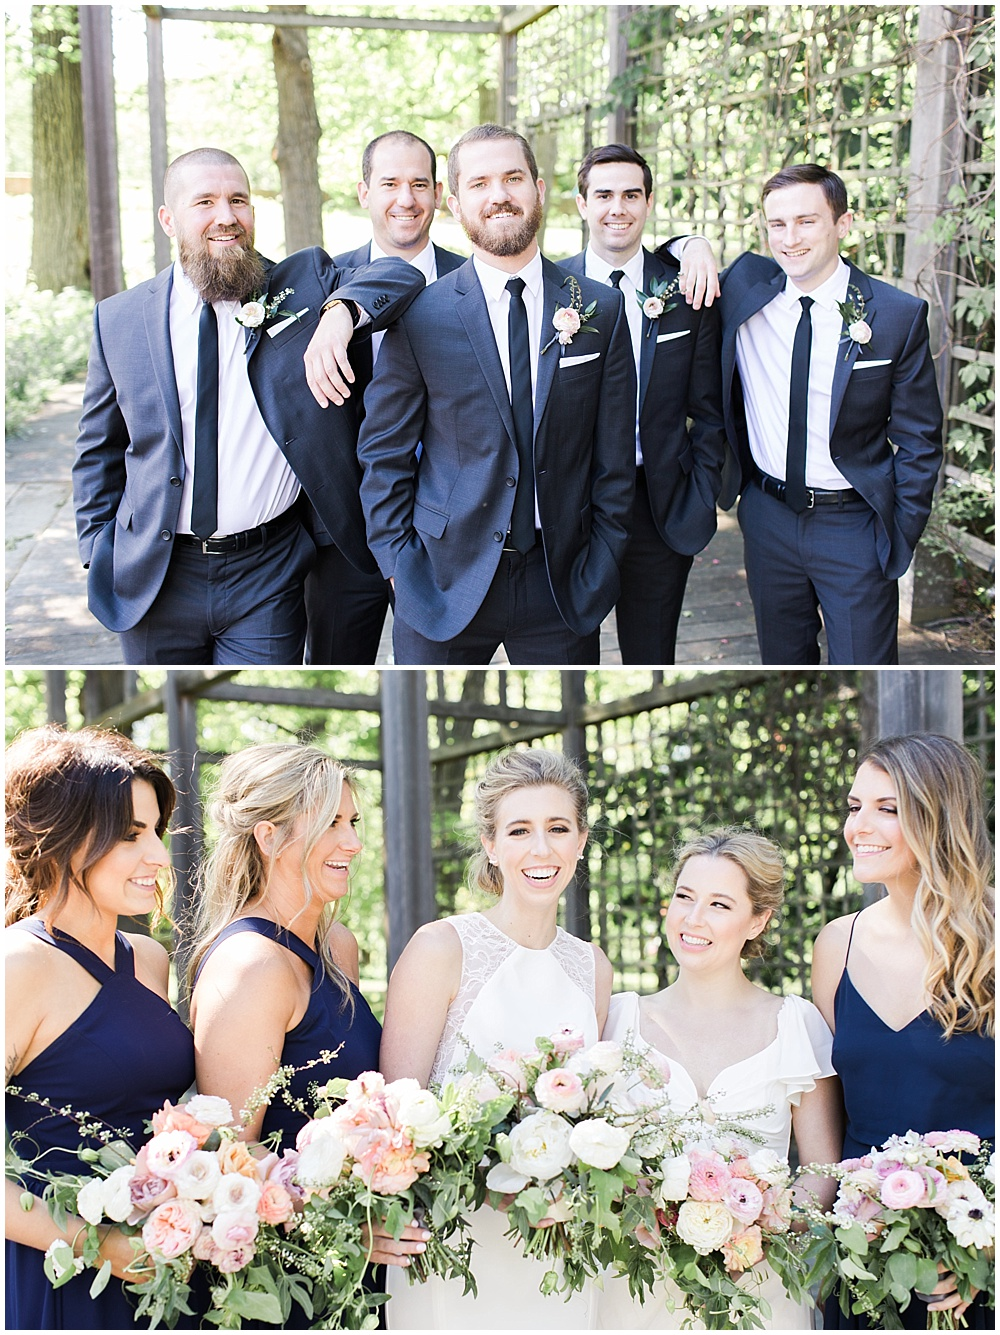 navy bridesmaids dresses, Spring floral + gold wedding | Ivan & Louise Images | Jessica Dum Wedding Coordination